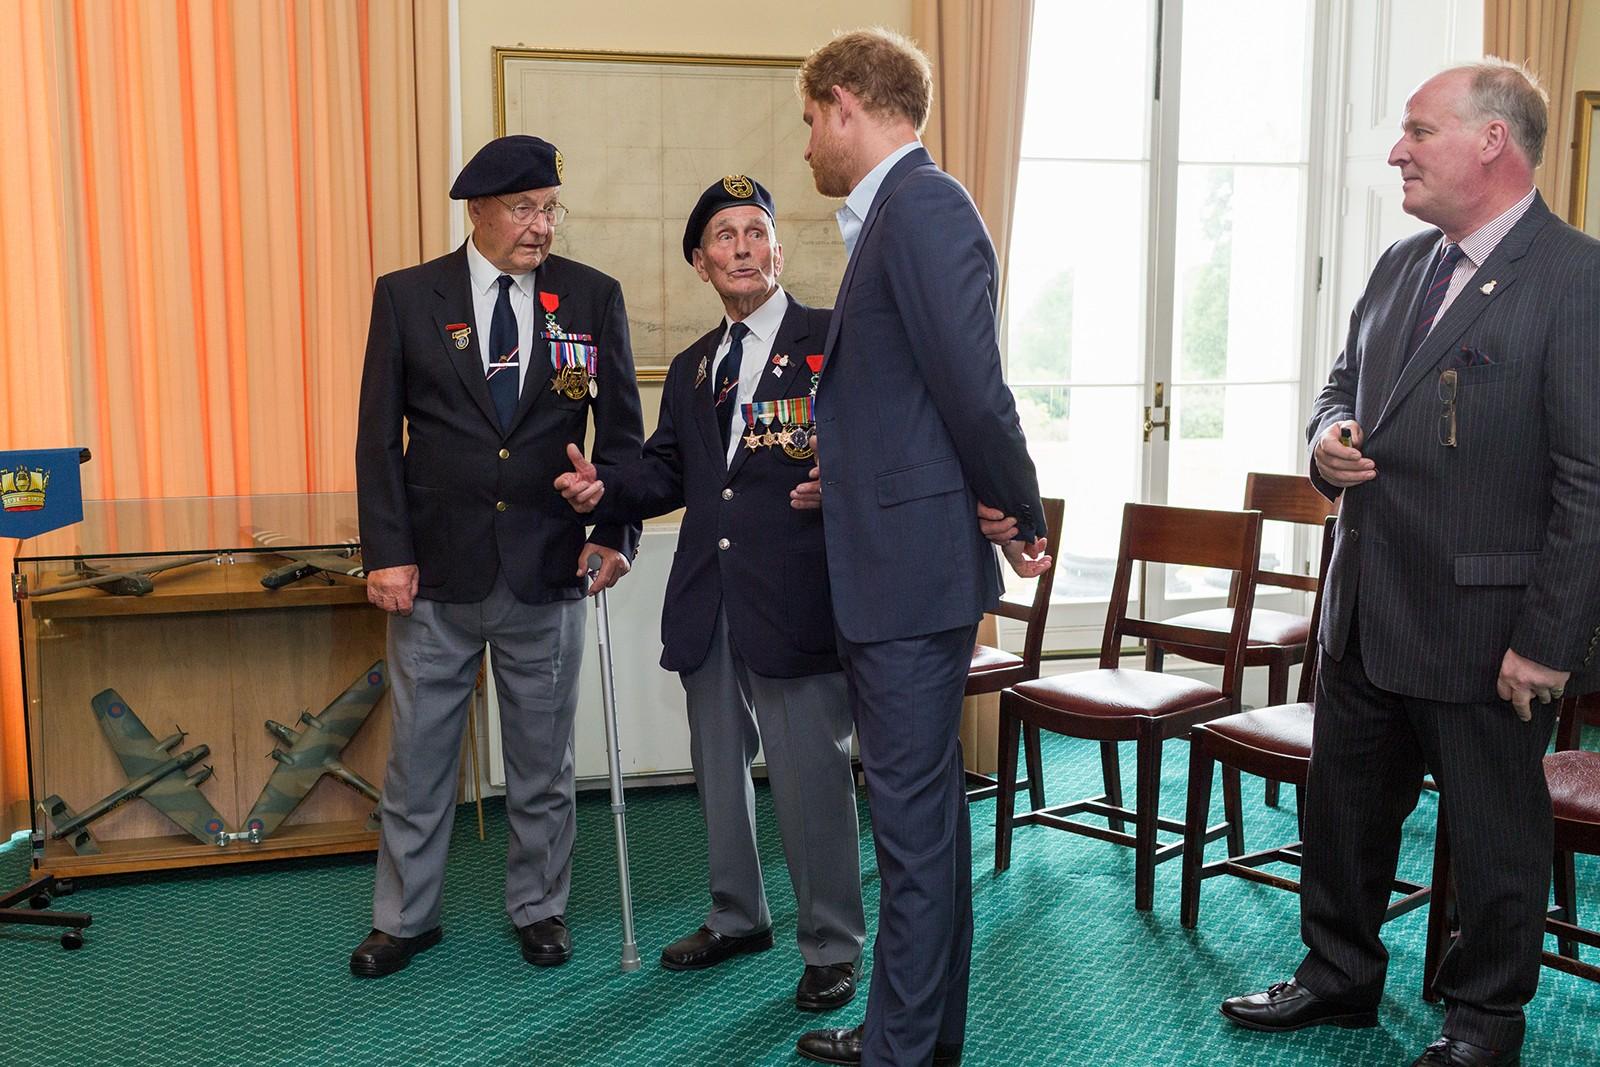 Royal Navy D-Day Veterans meet HRH Prince Harry